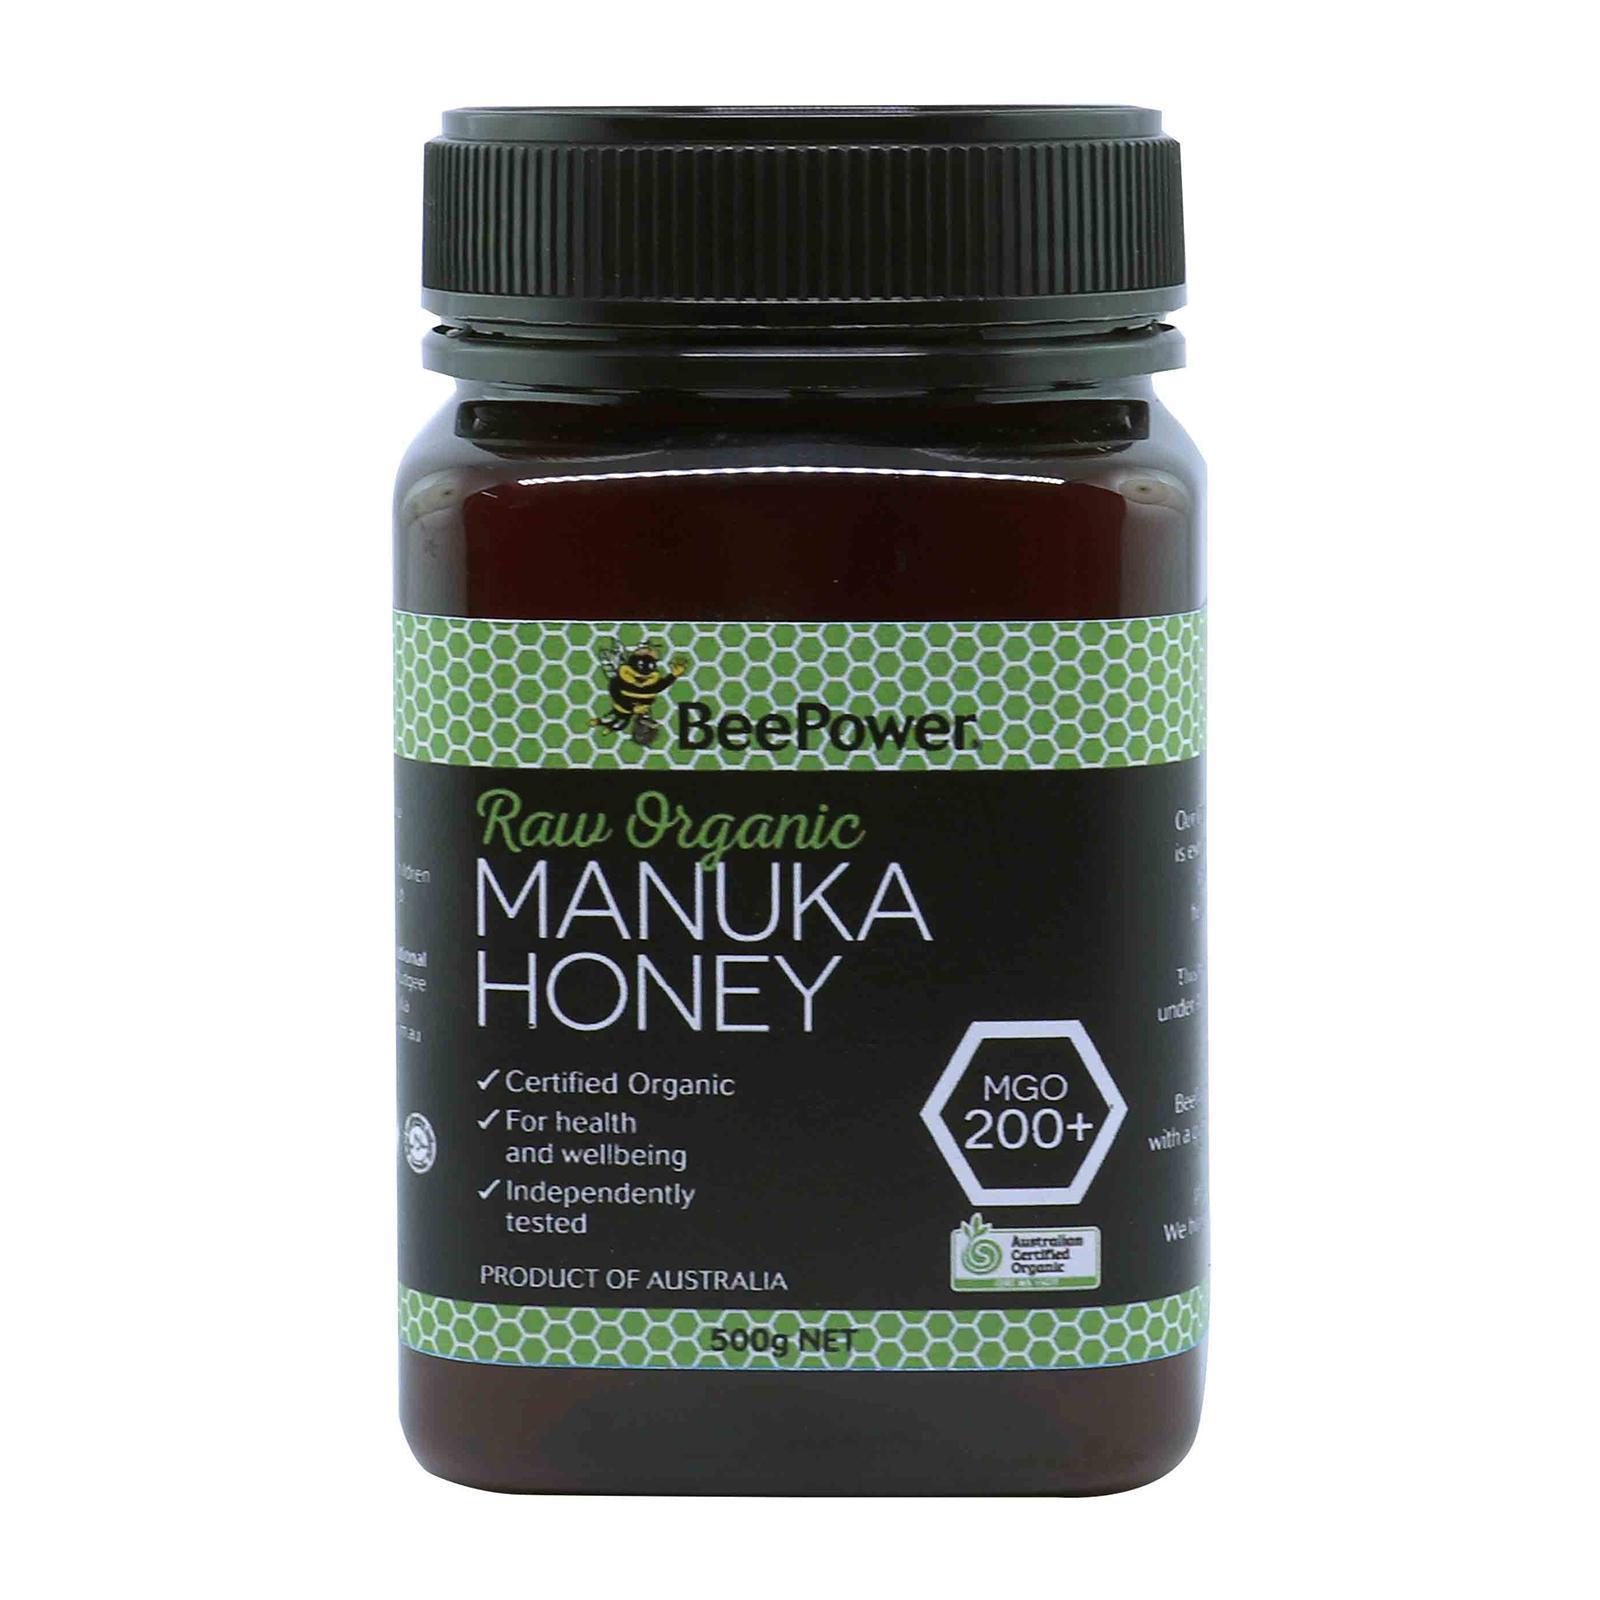 BEEPOWER Australia Organic Manuka Honey MGO 200+ - By Nature's Nutrition